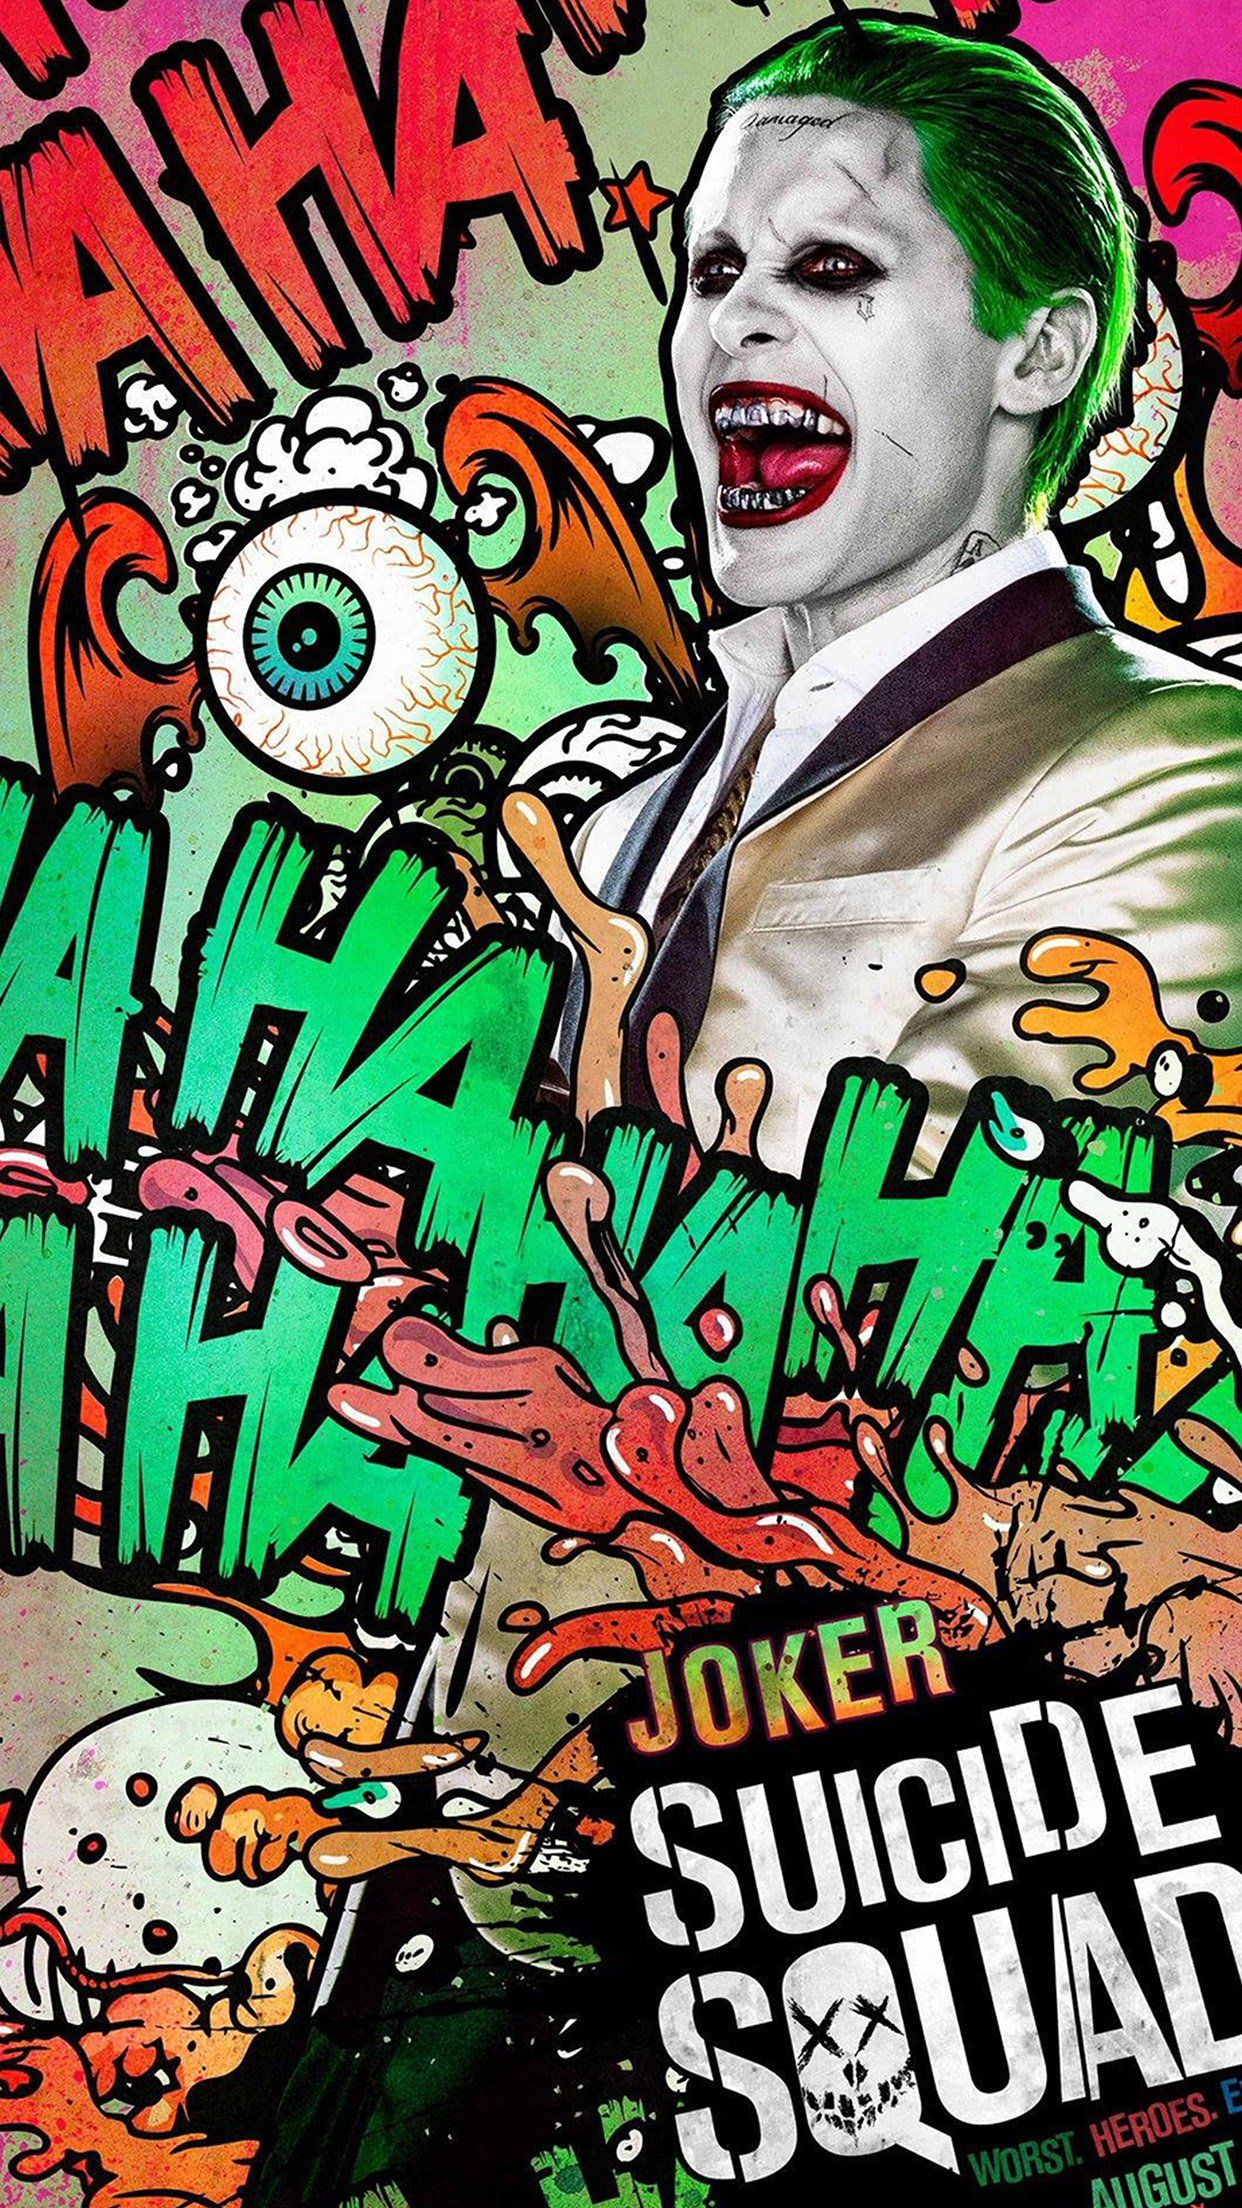 cool suicide-squad-film-poster-art-illustration-joker-iphone6-plus